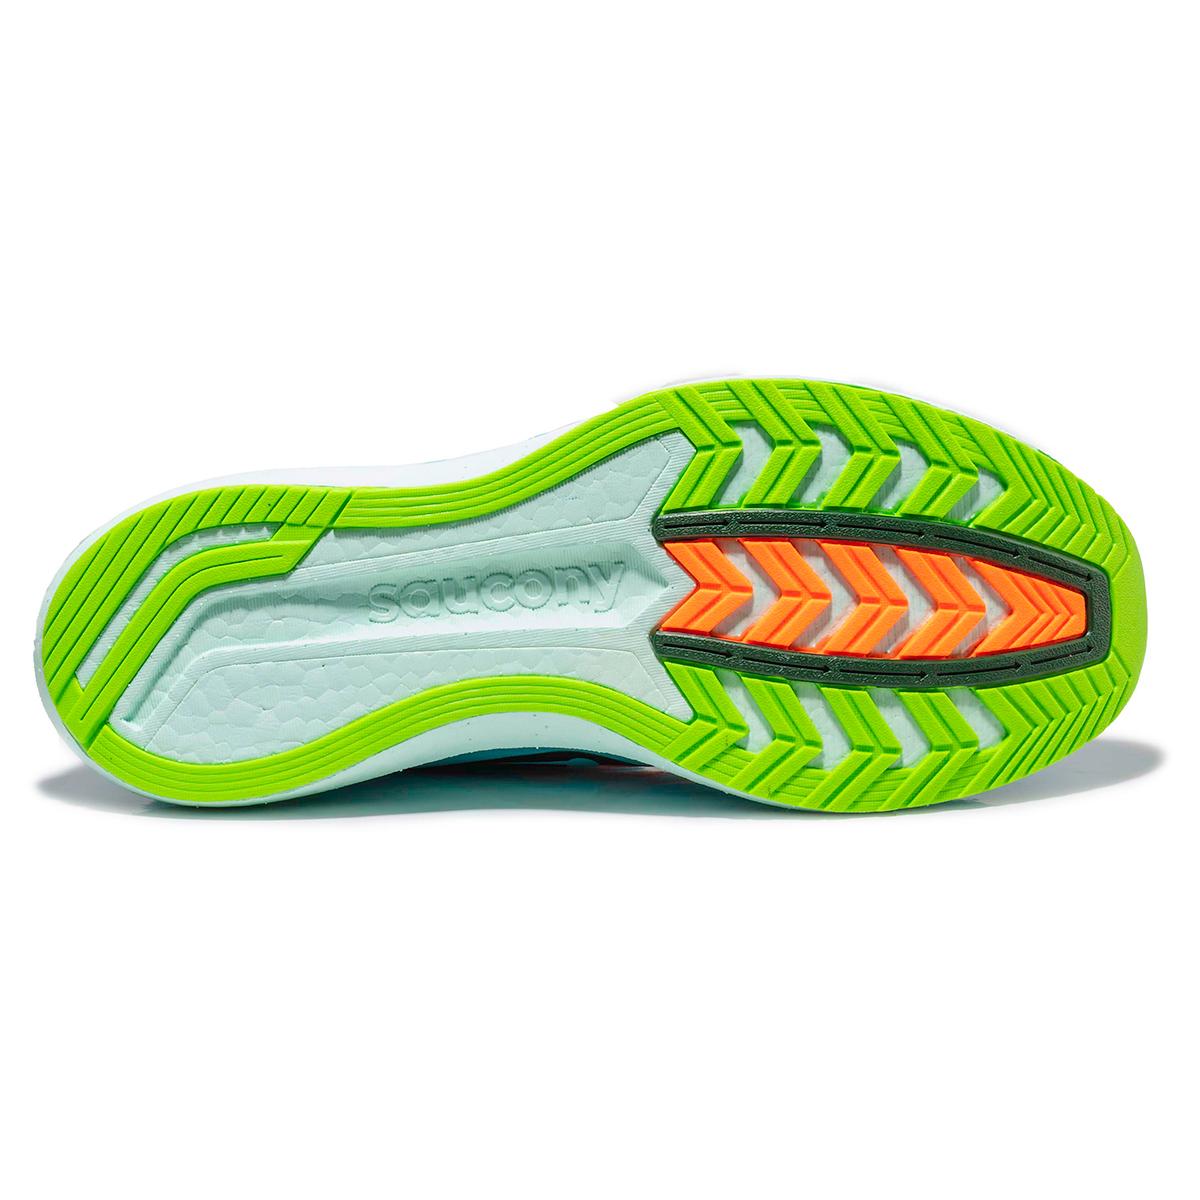 Men's Saucony Endorphin Pro Running Shoe - Color: Future/Blue - Size: 7 - Width: Regular, Future/Blue, large, image 4